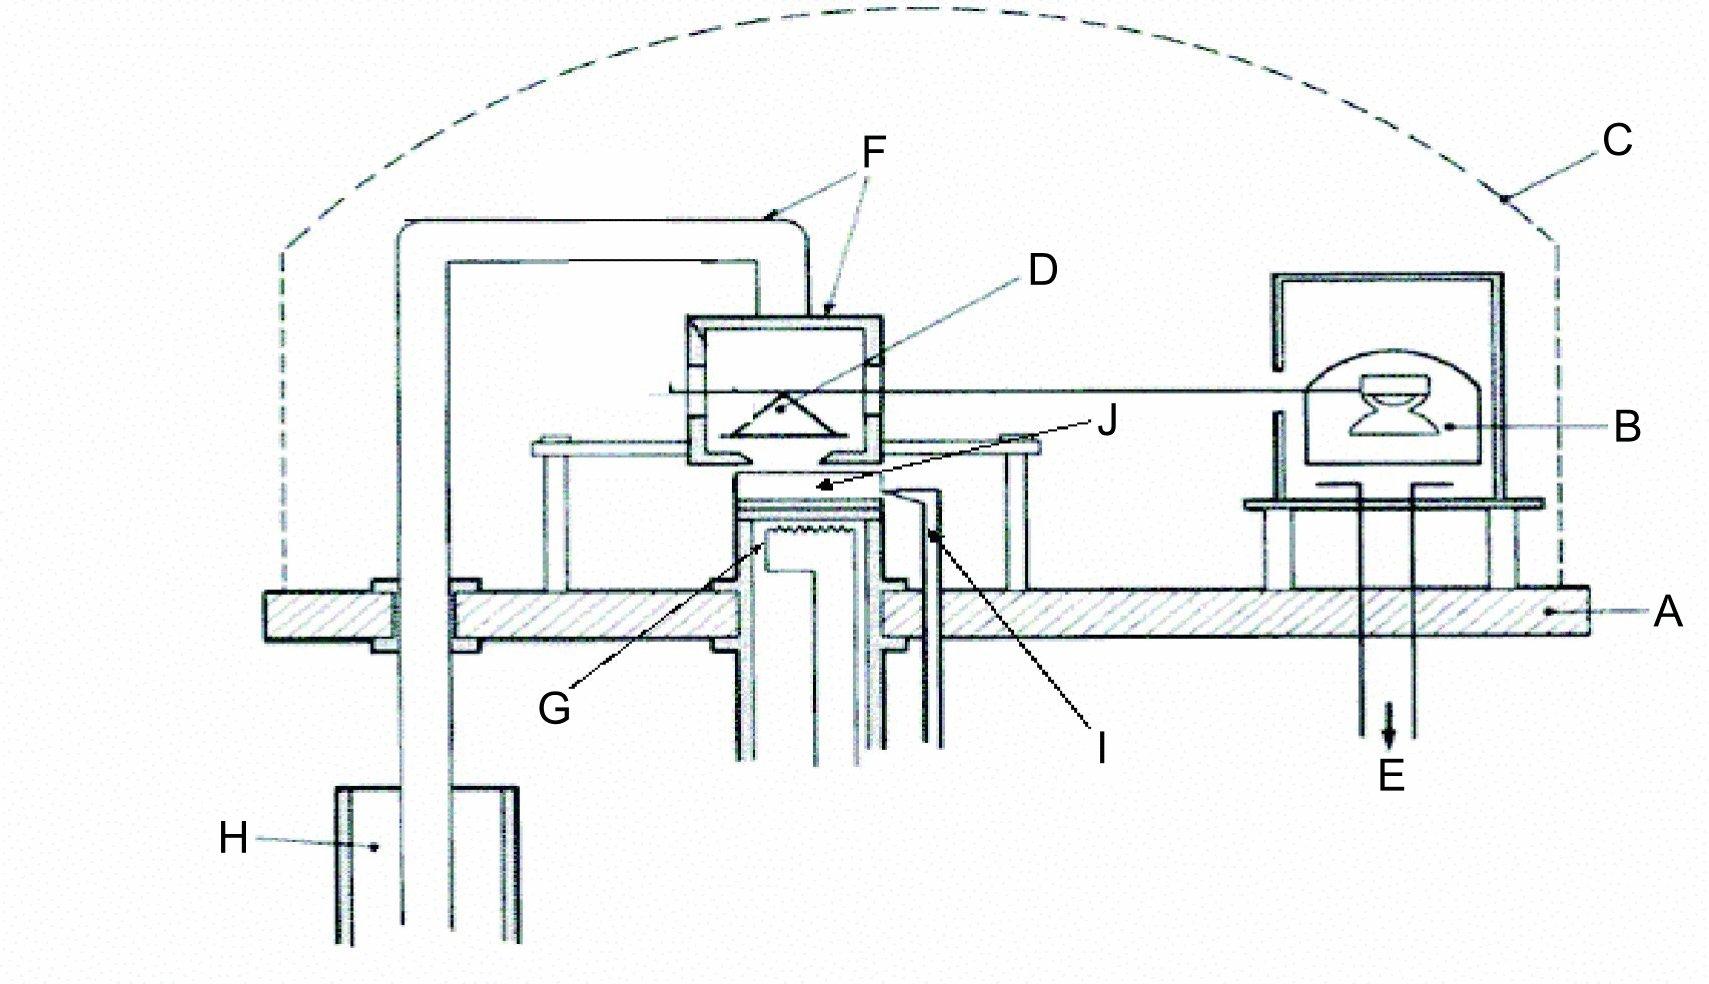 Eur Lex 02008r0440 20170518 En 1911 Pistol Diagram Of Parts Free Download Wiring Diagrams Pictures Image